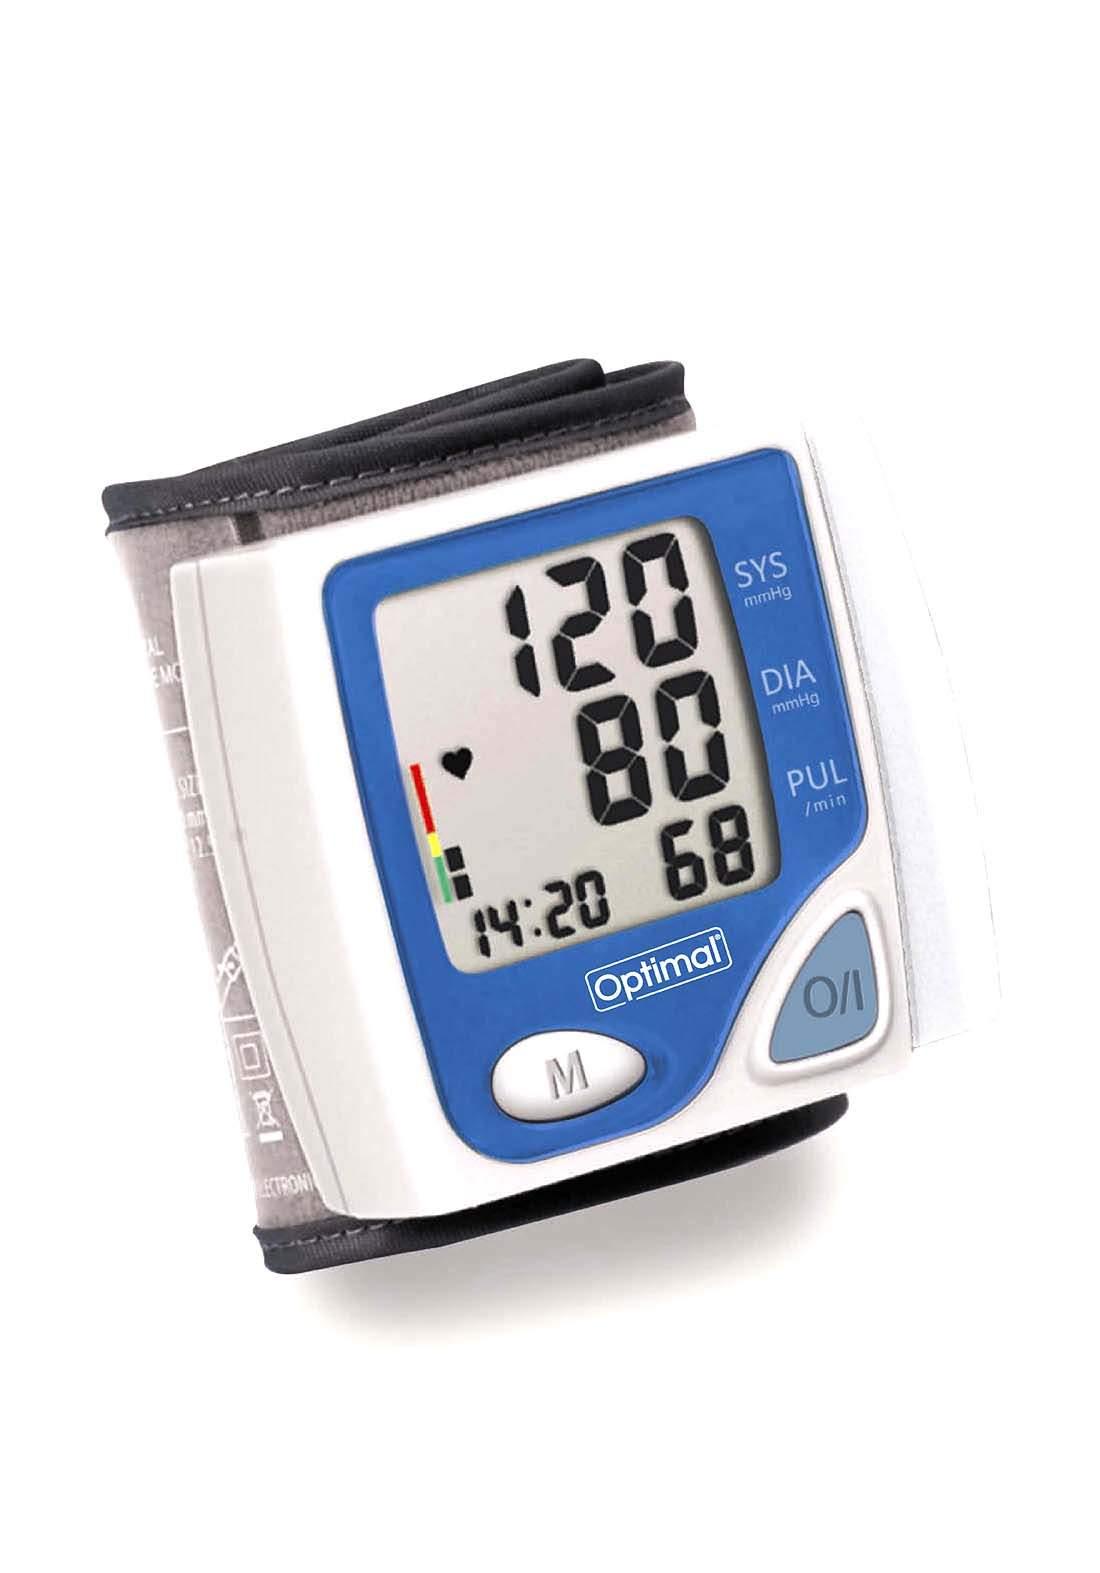 Optimal Wrist Type Digital Blood Pressure Monitor جهاز قياس ضغط الدم الرقمي